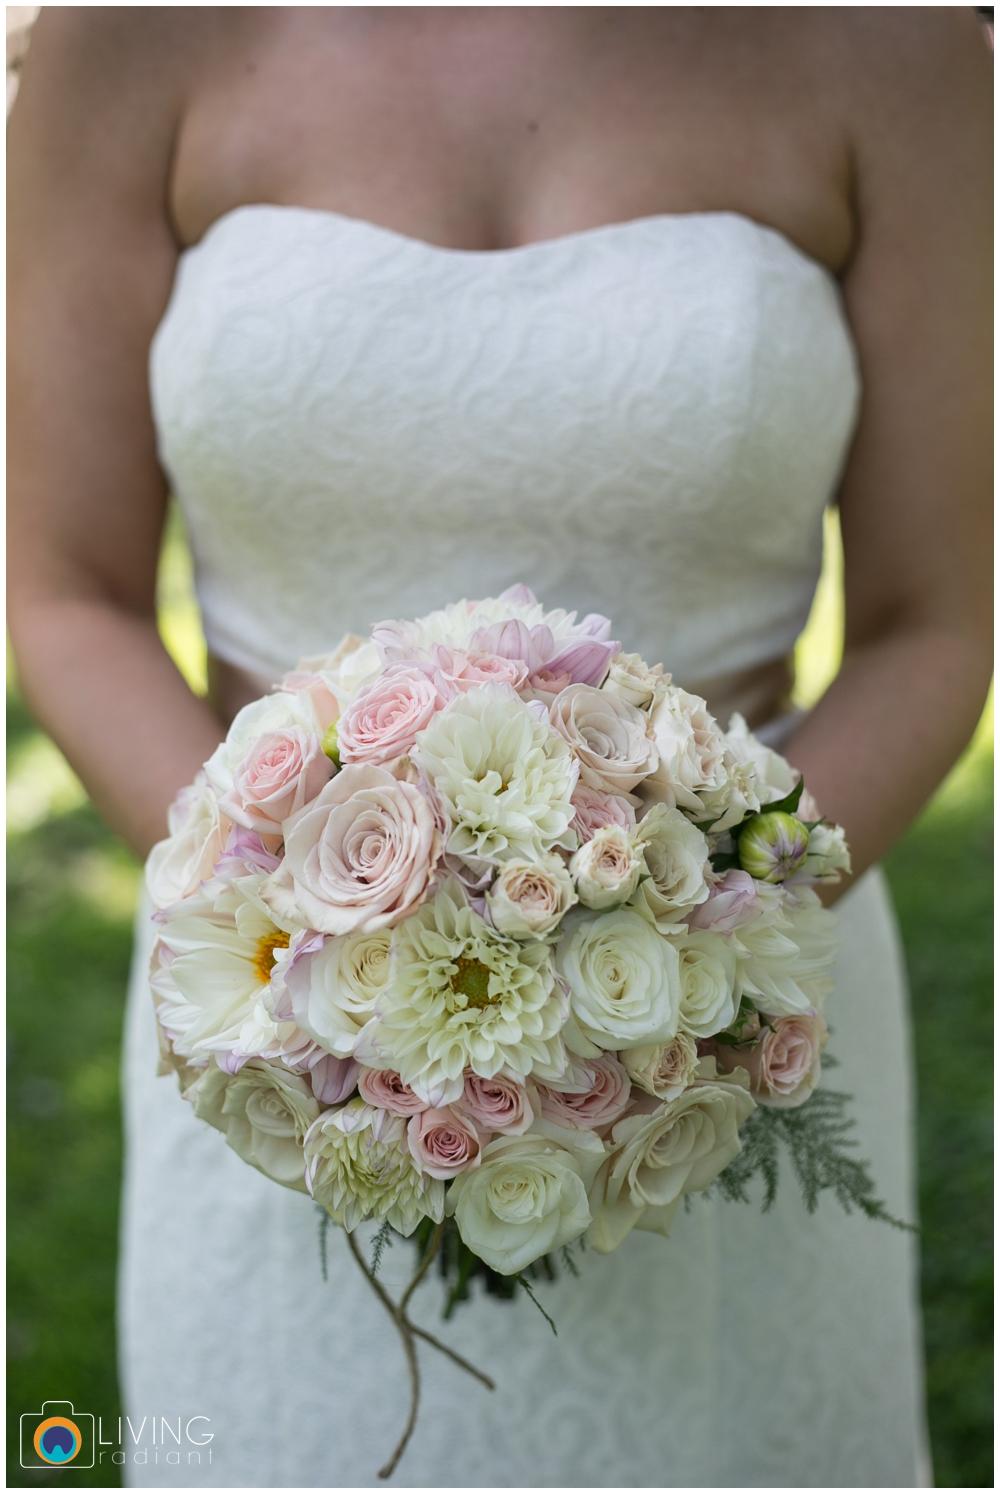 shannon-bill-bowers-wedding-living-radiant-photography-union-mills-homestead_0006.jpg